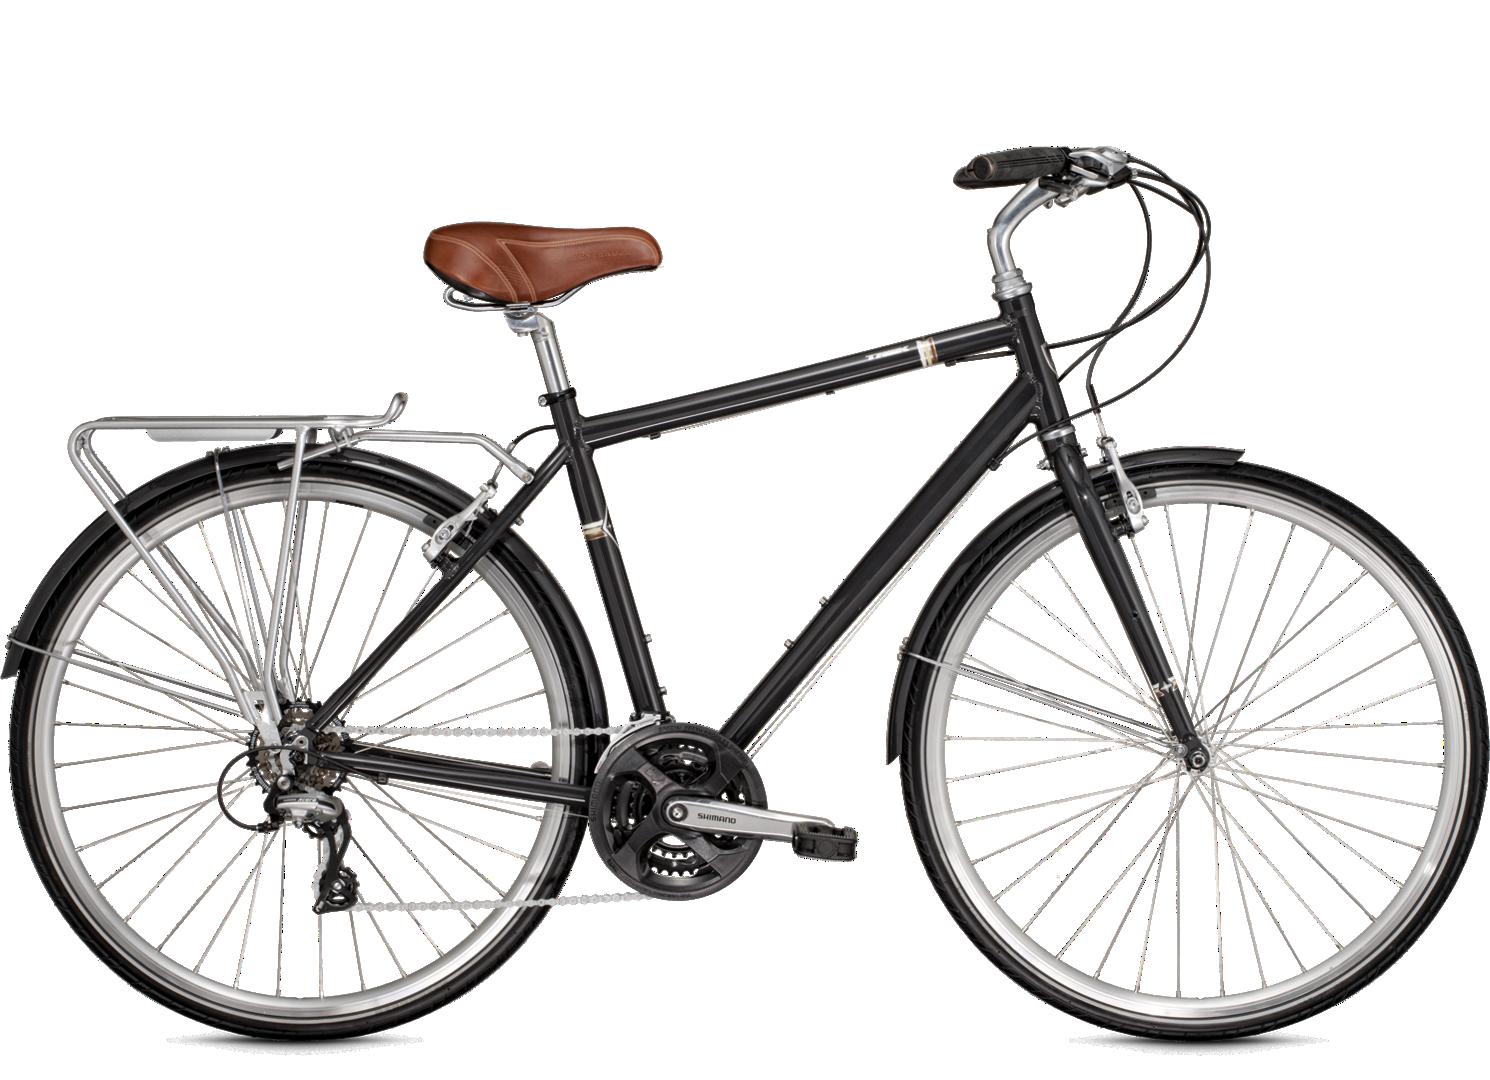 Allant Trek Bicycle 640 Commuter Bike Urban Bike Trek Bikes